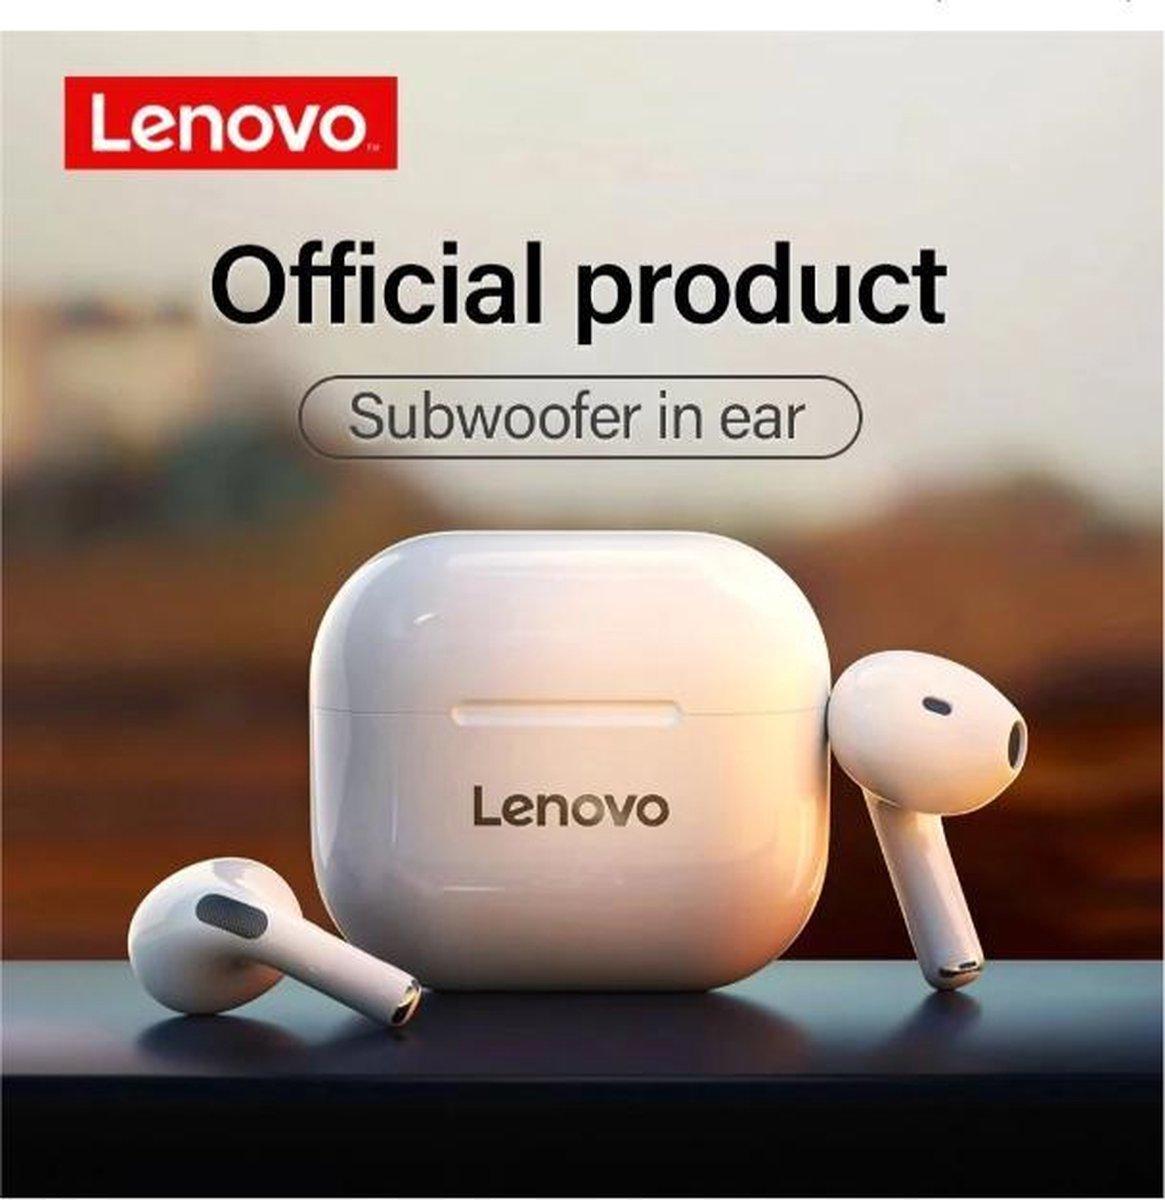 Oordop - Airpods - Wireless Earphones - Draadloos - Draadloze Oordopjes - Draadloze Oortjes - Bluetooth Oordopjes - Oor - Earpods - Bluetooth Oortjes - Nieuwe Collectie 2021 - Wit